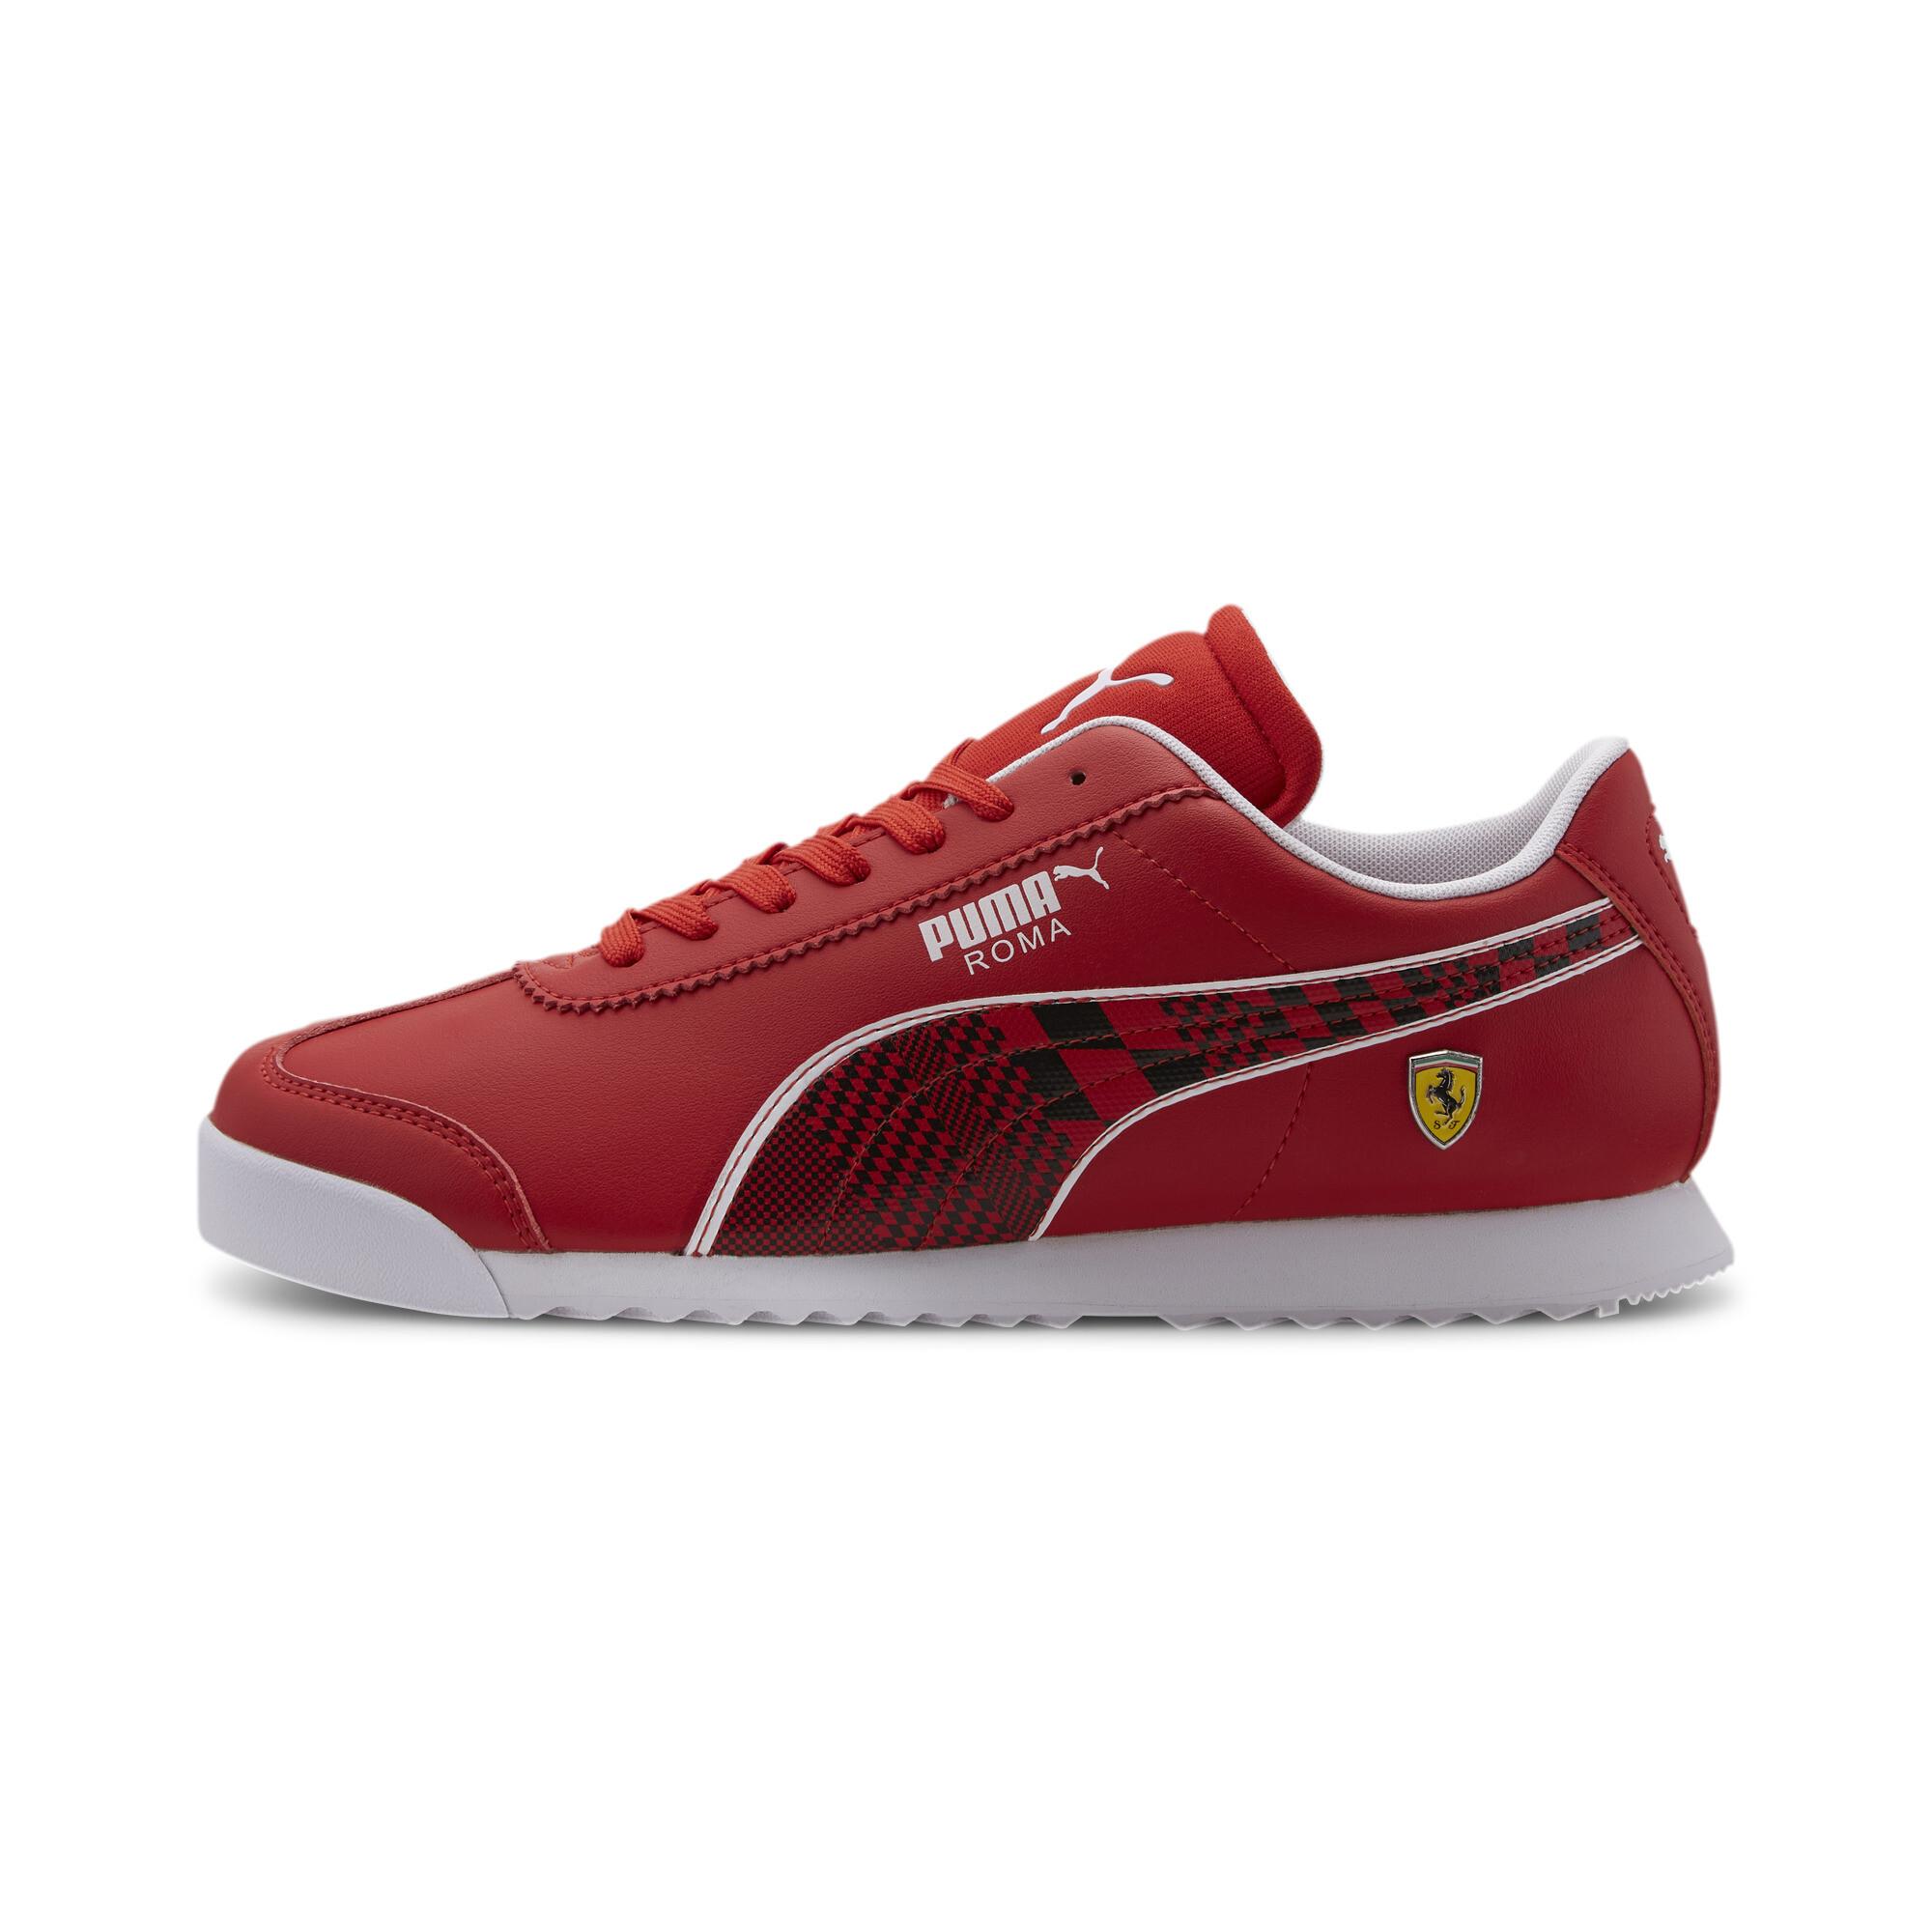 PUMA-Men-039-s-Scuderia-Ferrari-Roma-Sneakers thumbnail 19